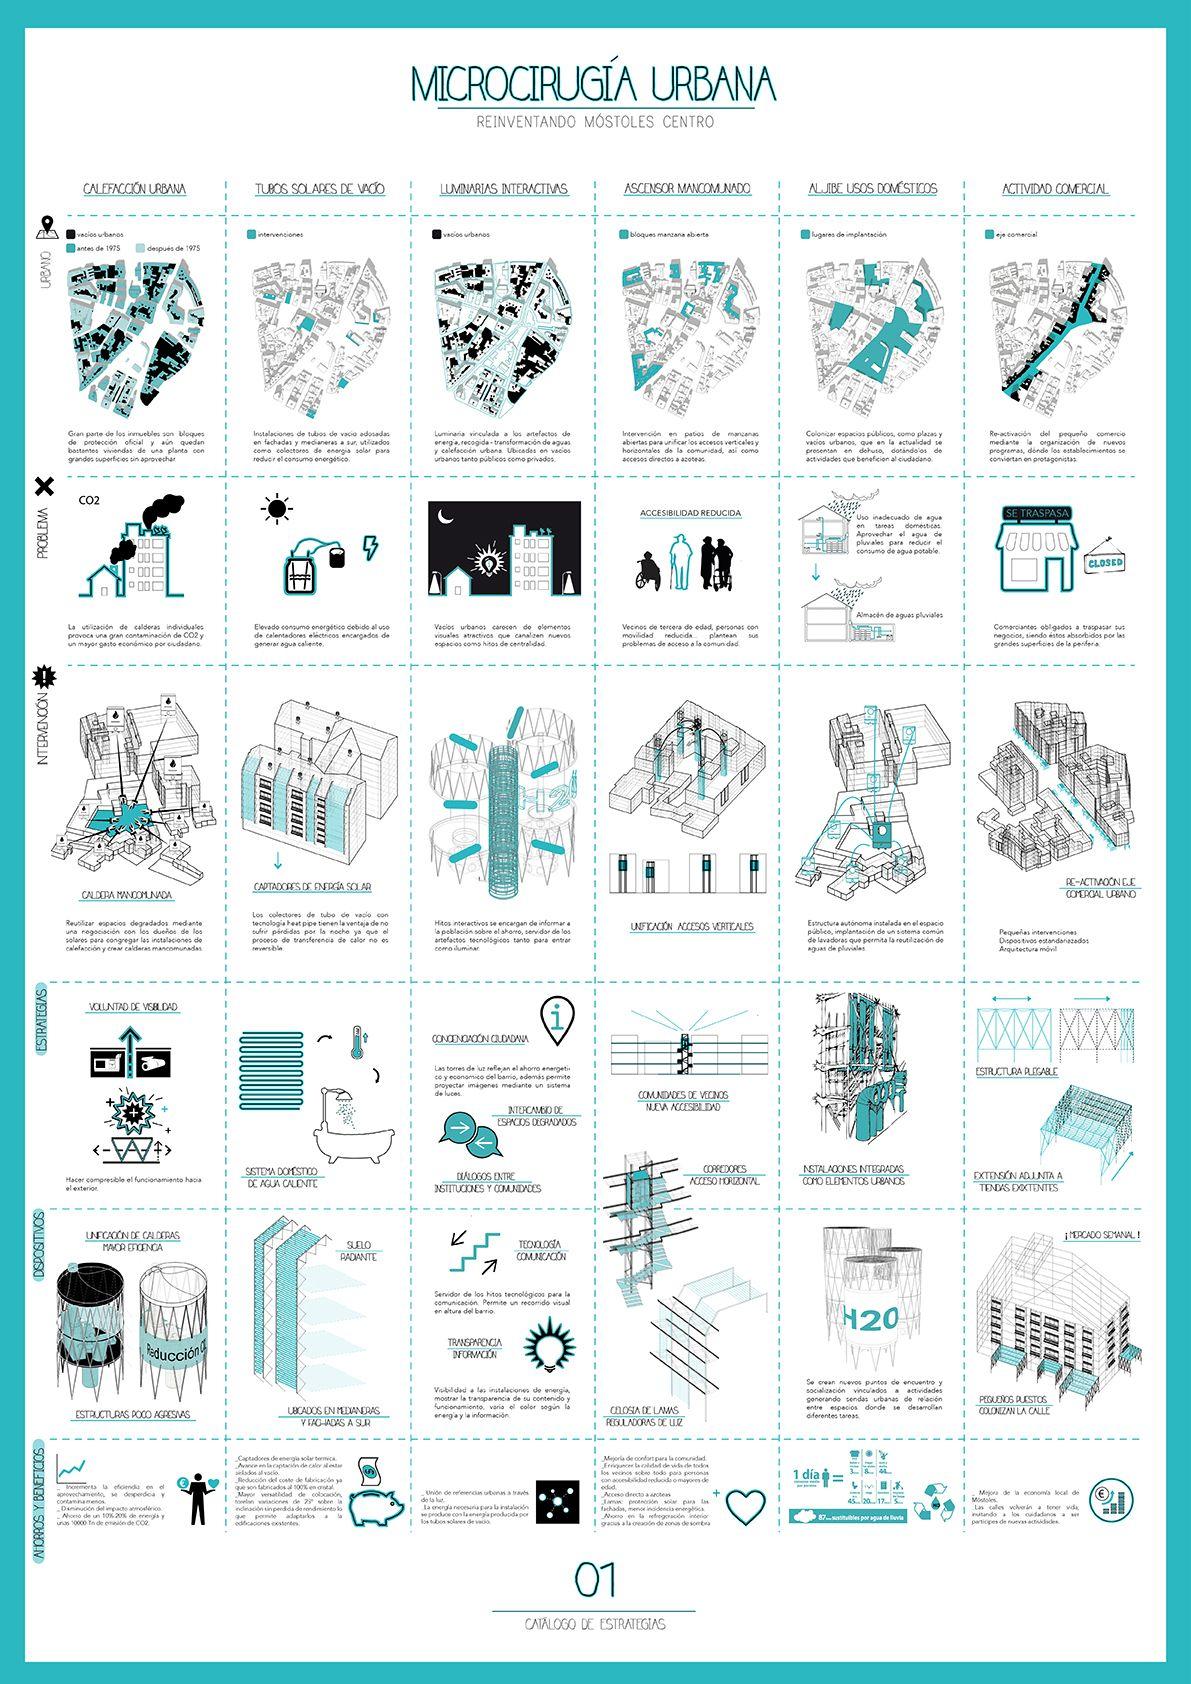 Galera de microciruga urbana primer lugar en concurso microciruga urbana primer lugar en concurso reinventar mstoles centro espaa pooptronica Image collections